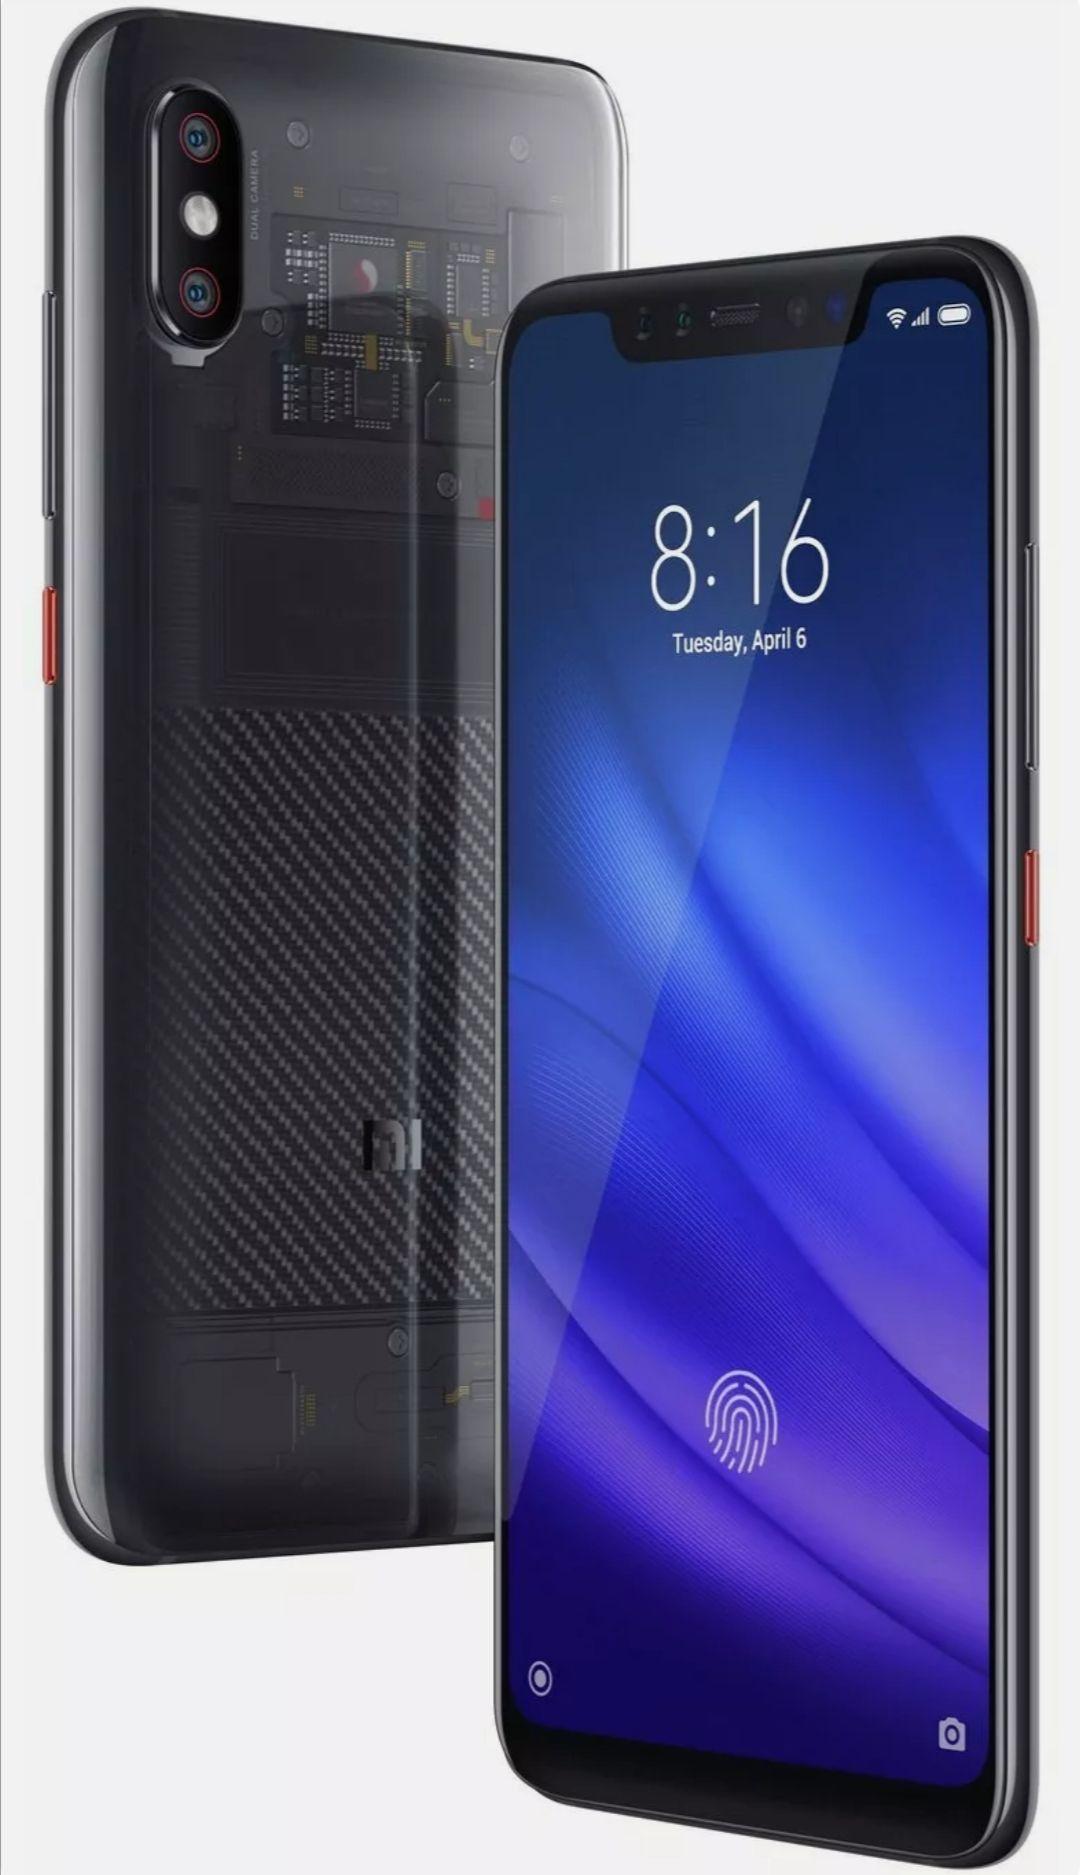 SIM Free Xiaomi Mi 8 Pro 6.26 Inch 128GB 20MP 4G Android Mobile Phone - Black Refurbished - £149.19 @ Argos / Ebay